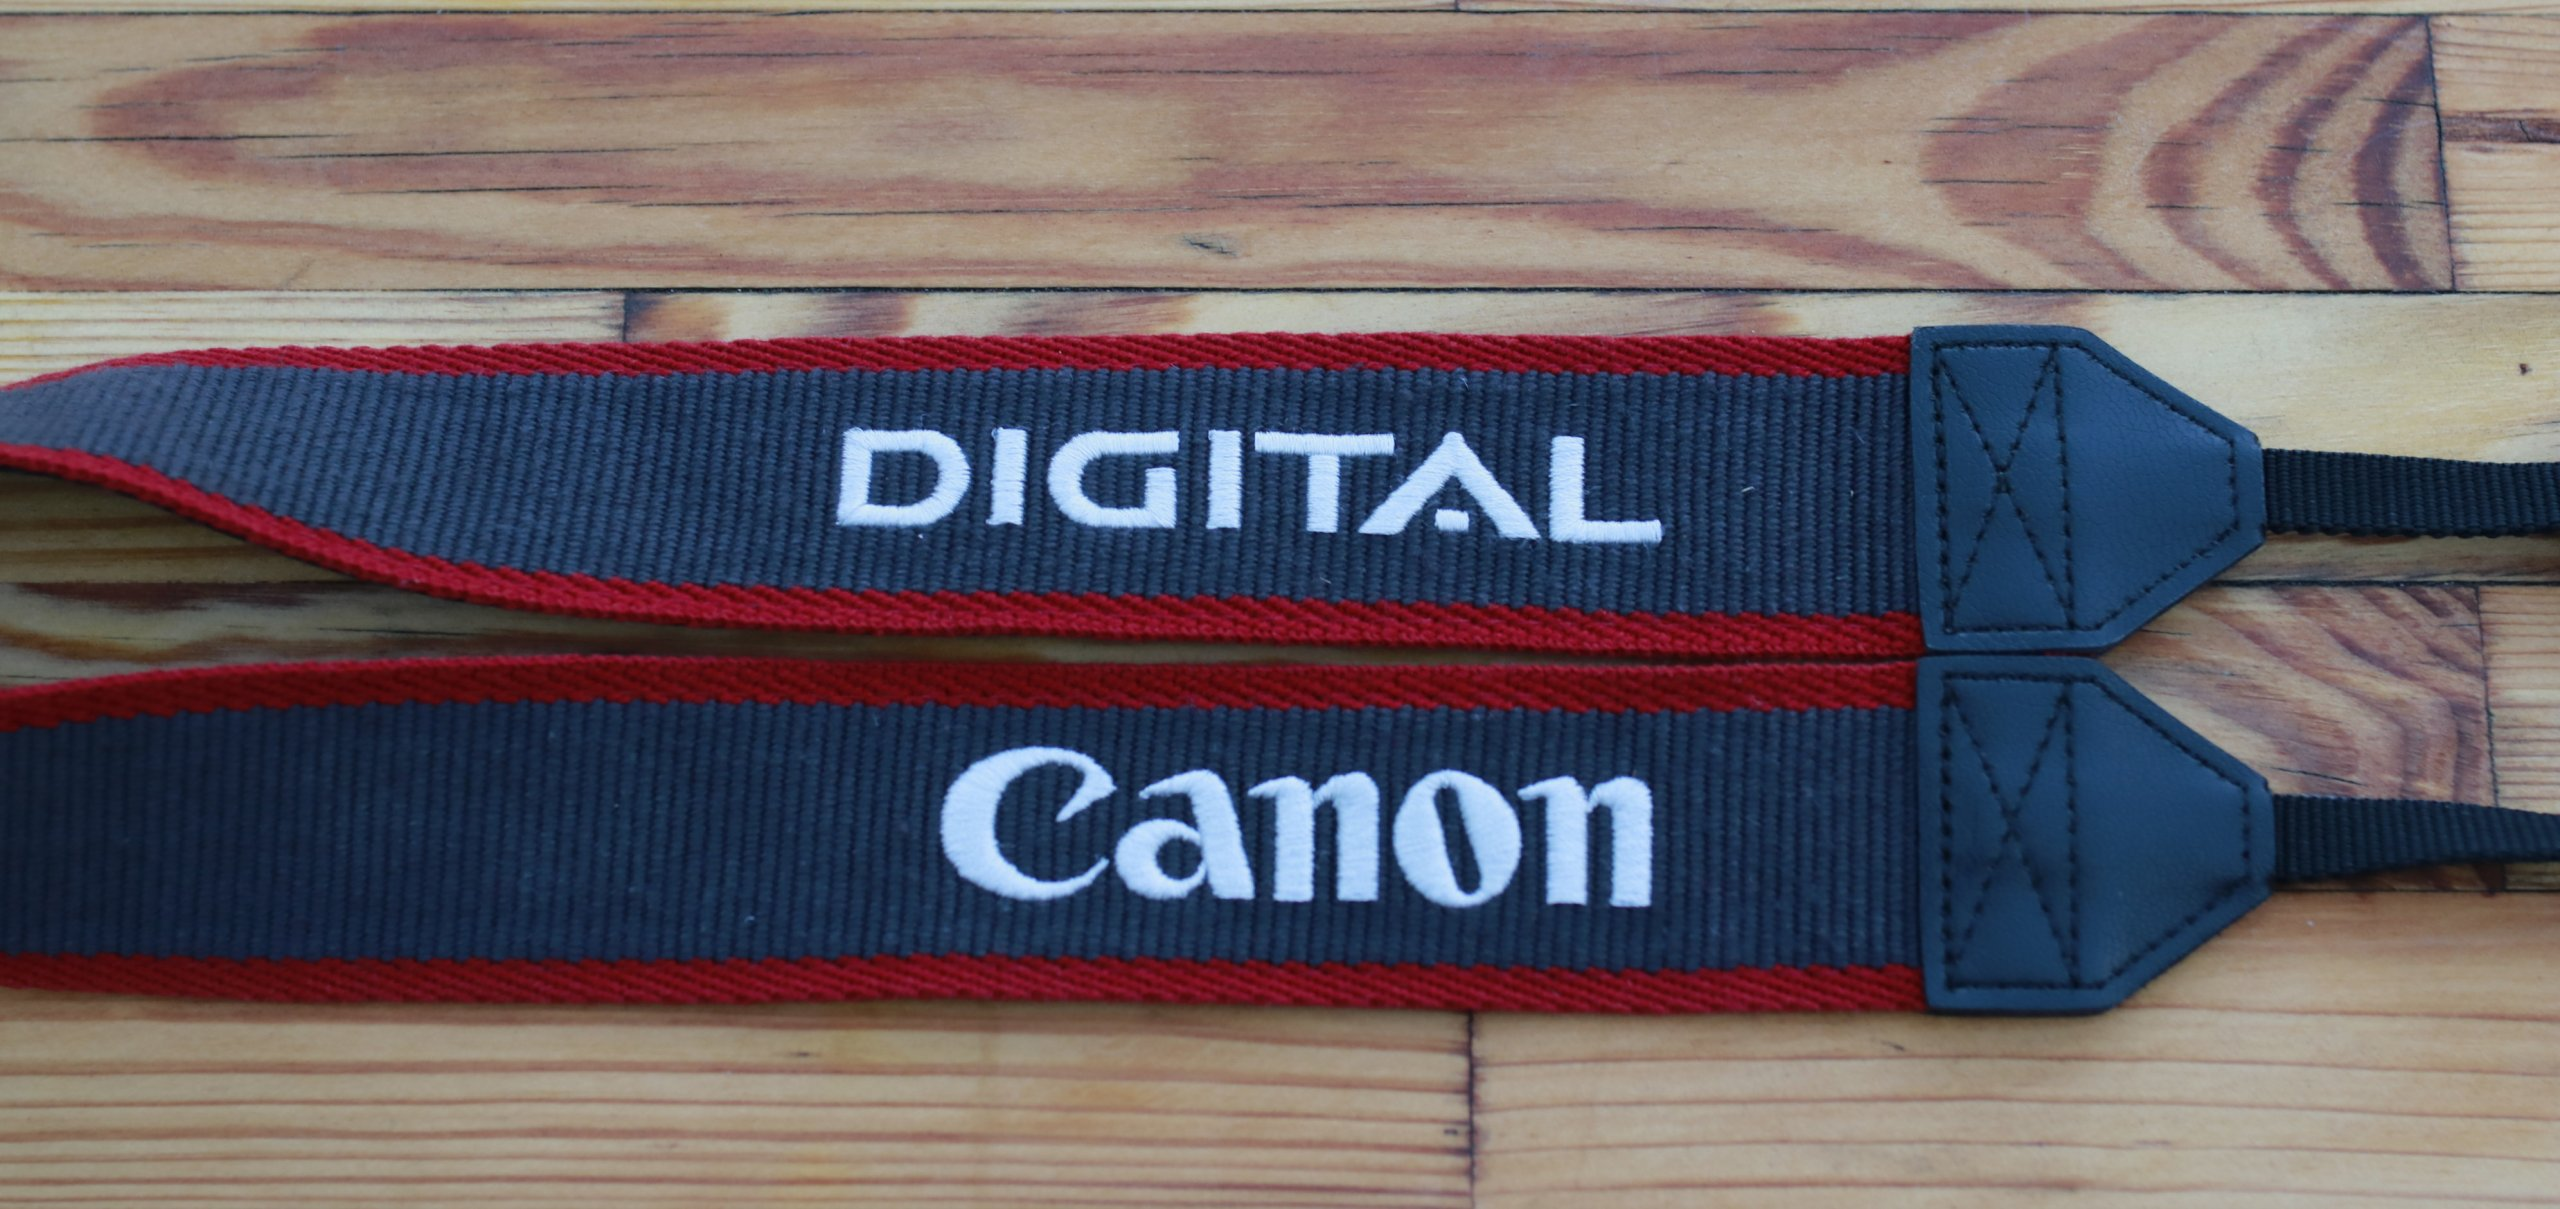 298bef68ac8f CANON EOS DIGITAL - pasek do aparatu - 7295867258 - oficjalne ...